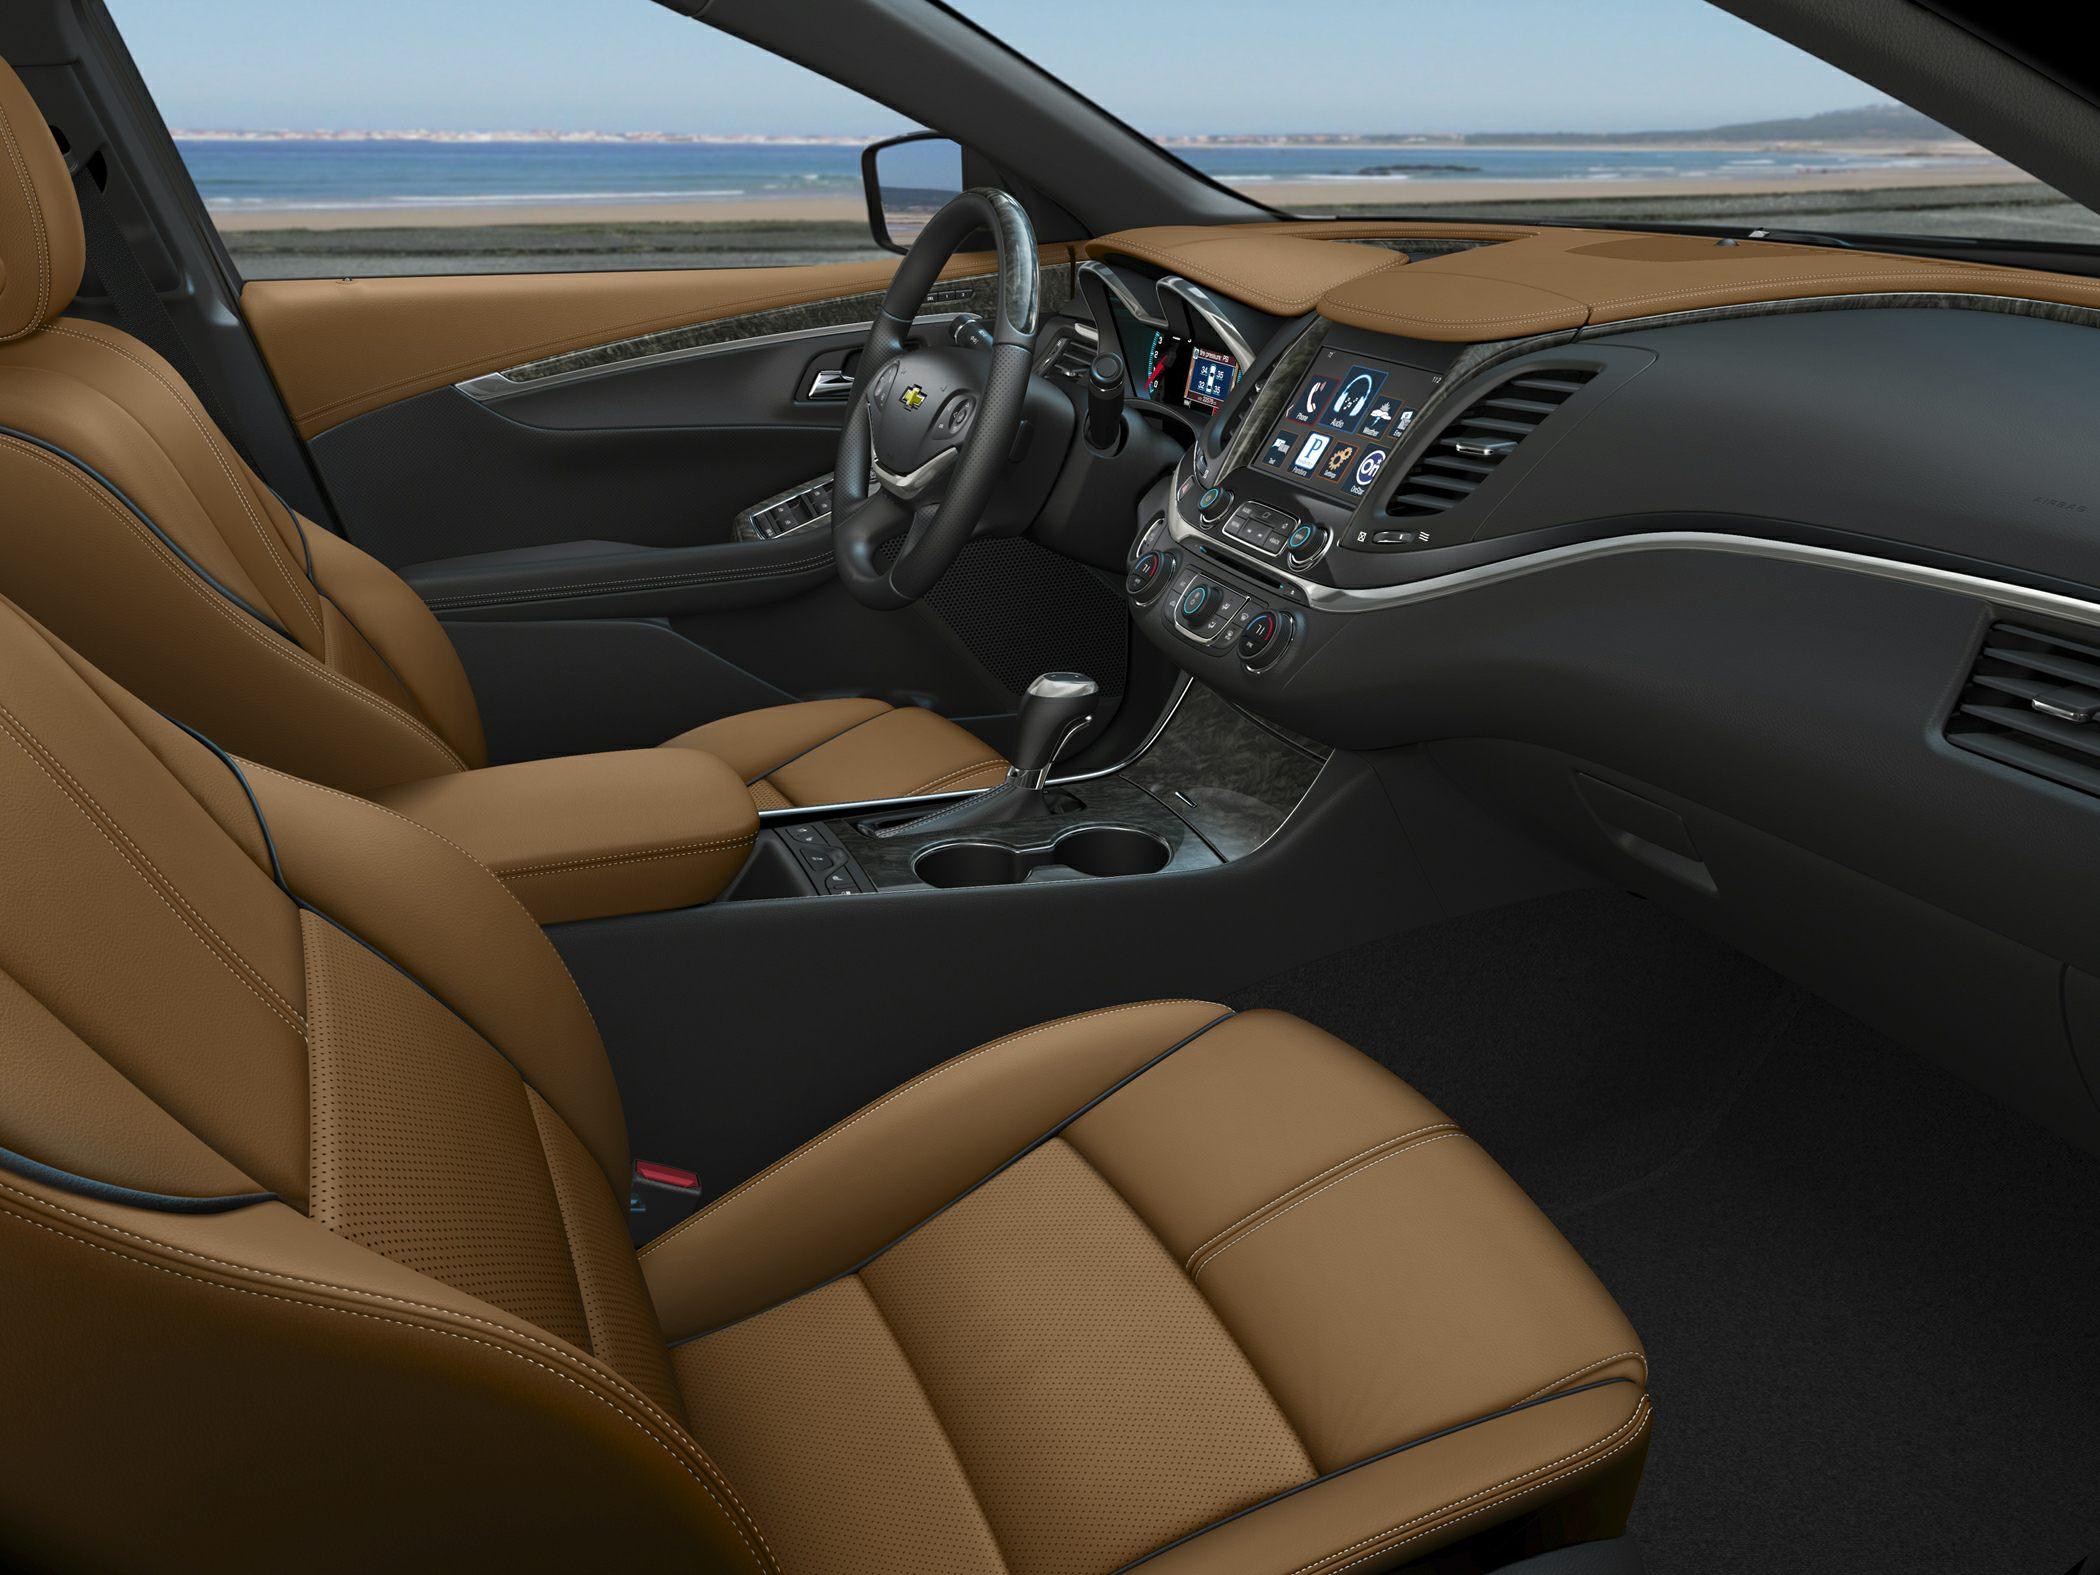 2015 Chevrolet Impala Front Seats